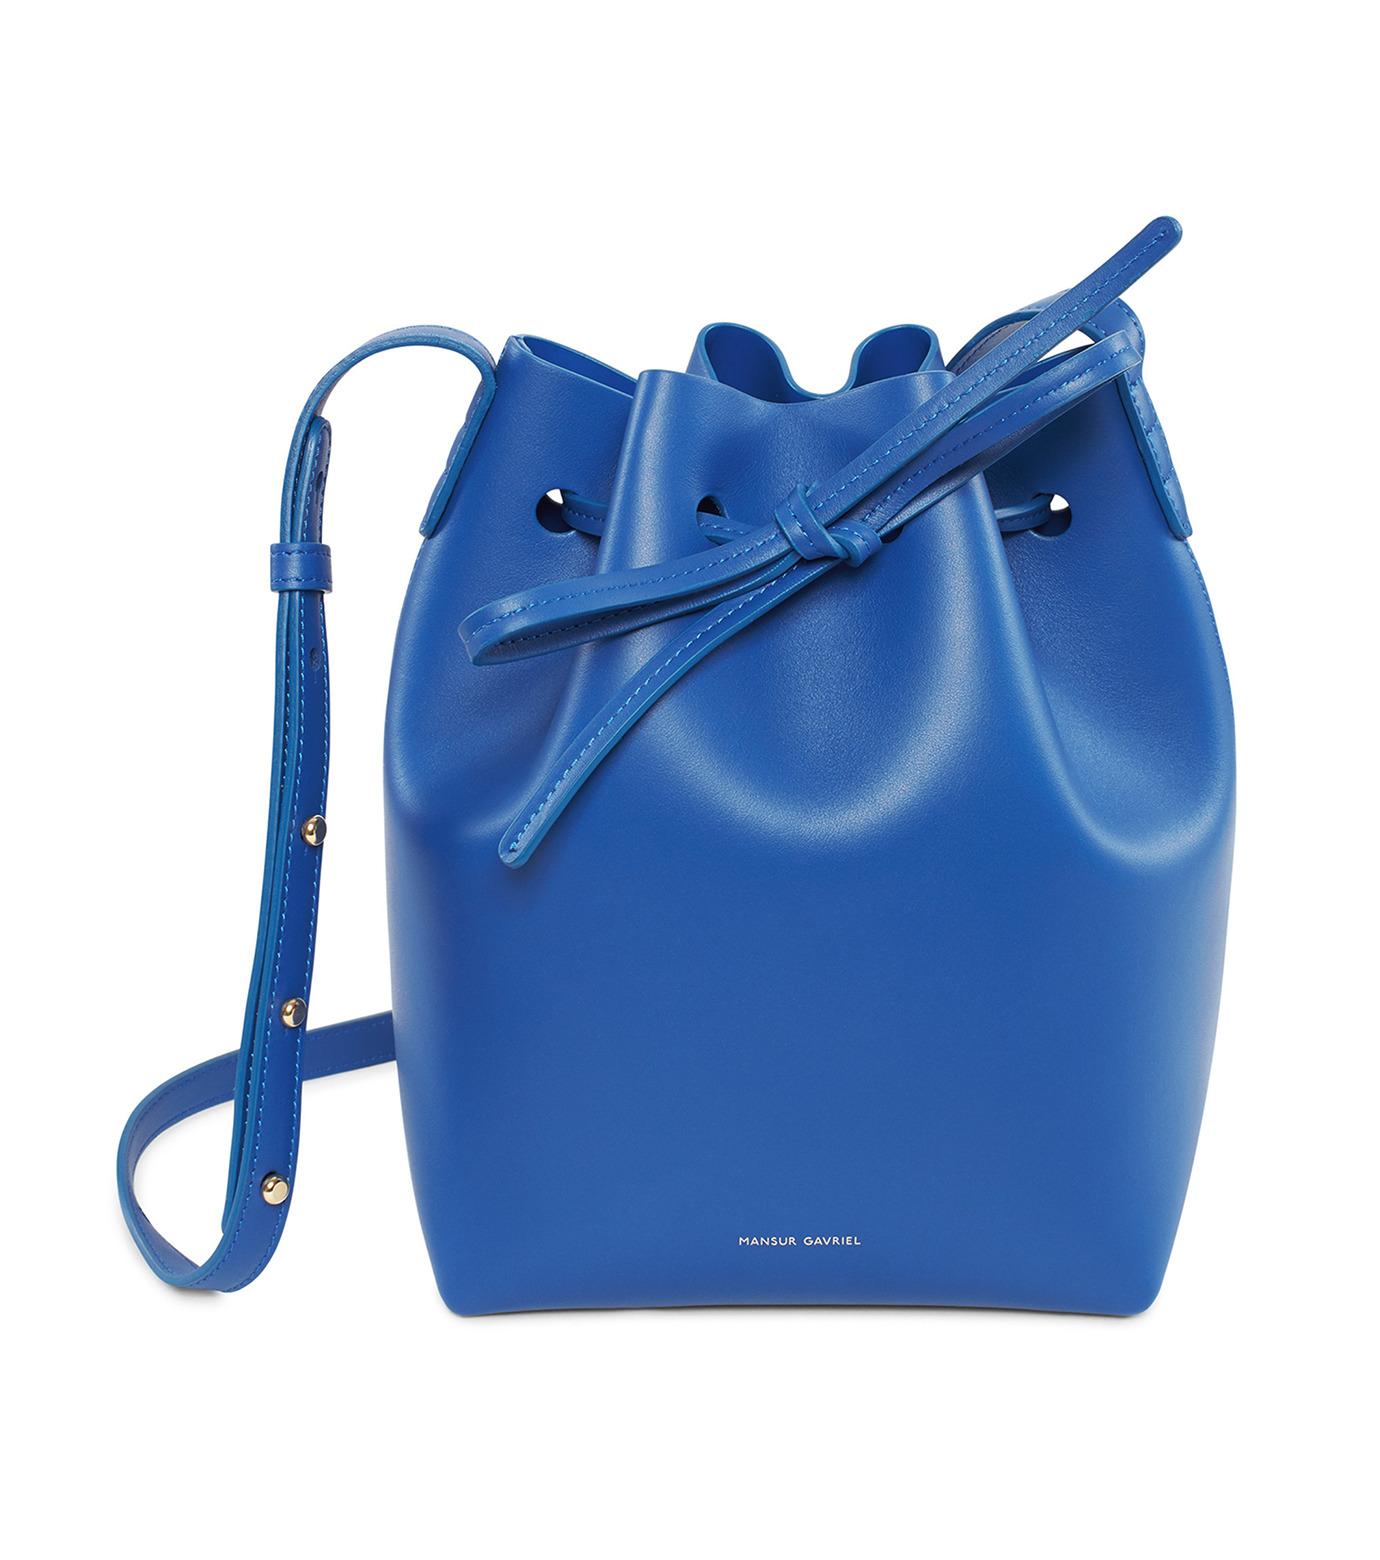 Mansur Gavriel(マンサーガブリエル)のMini Bucket Bag-BLUE(バッグ/bag)-HMB004CA-92 拡大詳細画像1